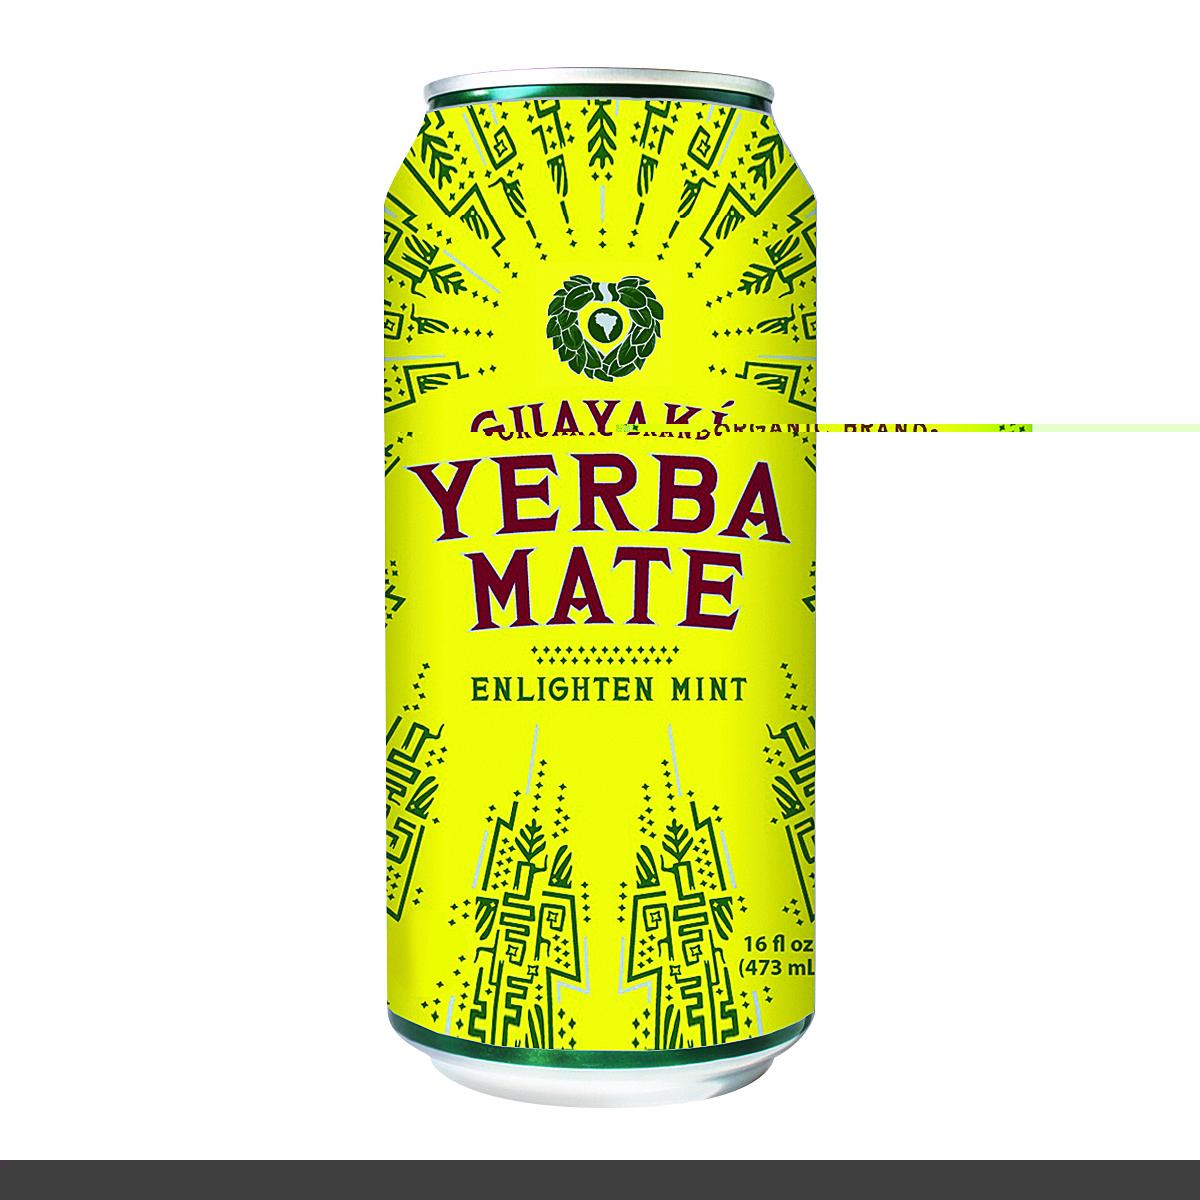 Guayaki Yerba Mate - Enlighten Mint - Case of 12 - 15.5 Fl oz.